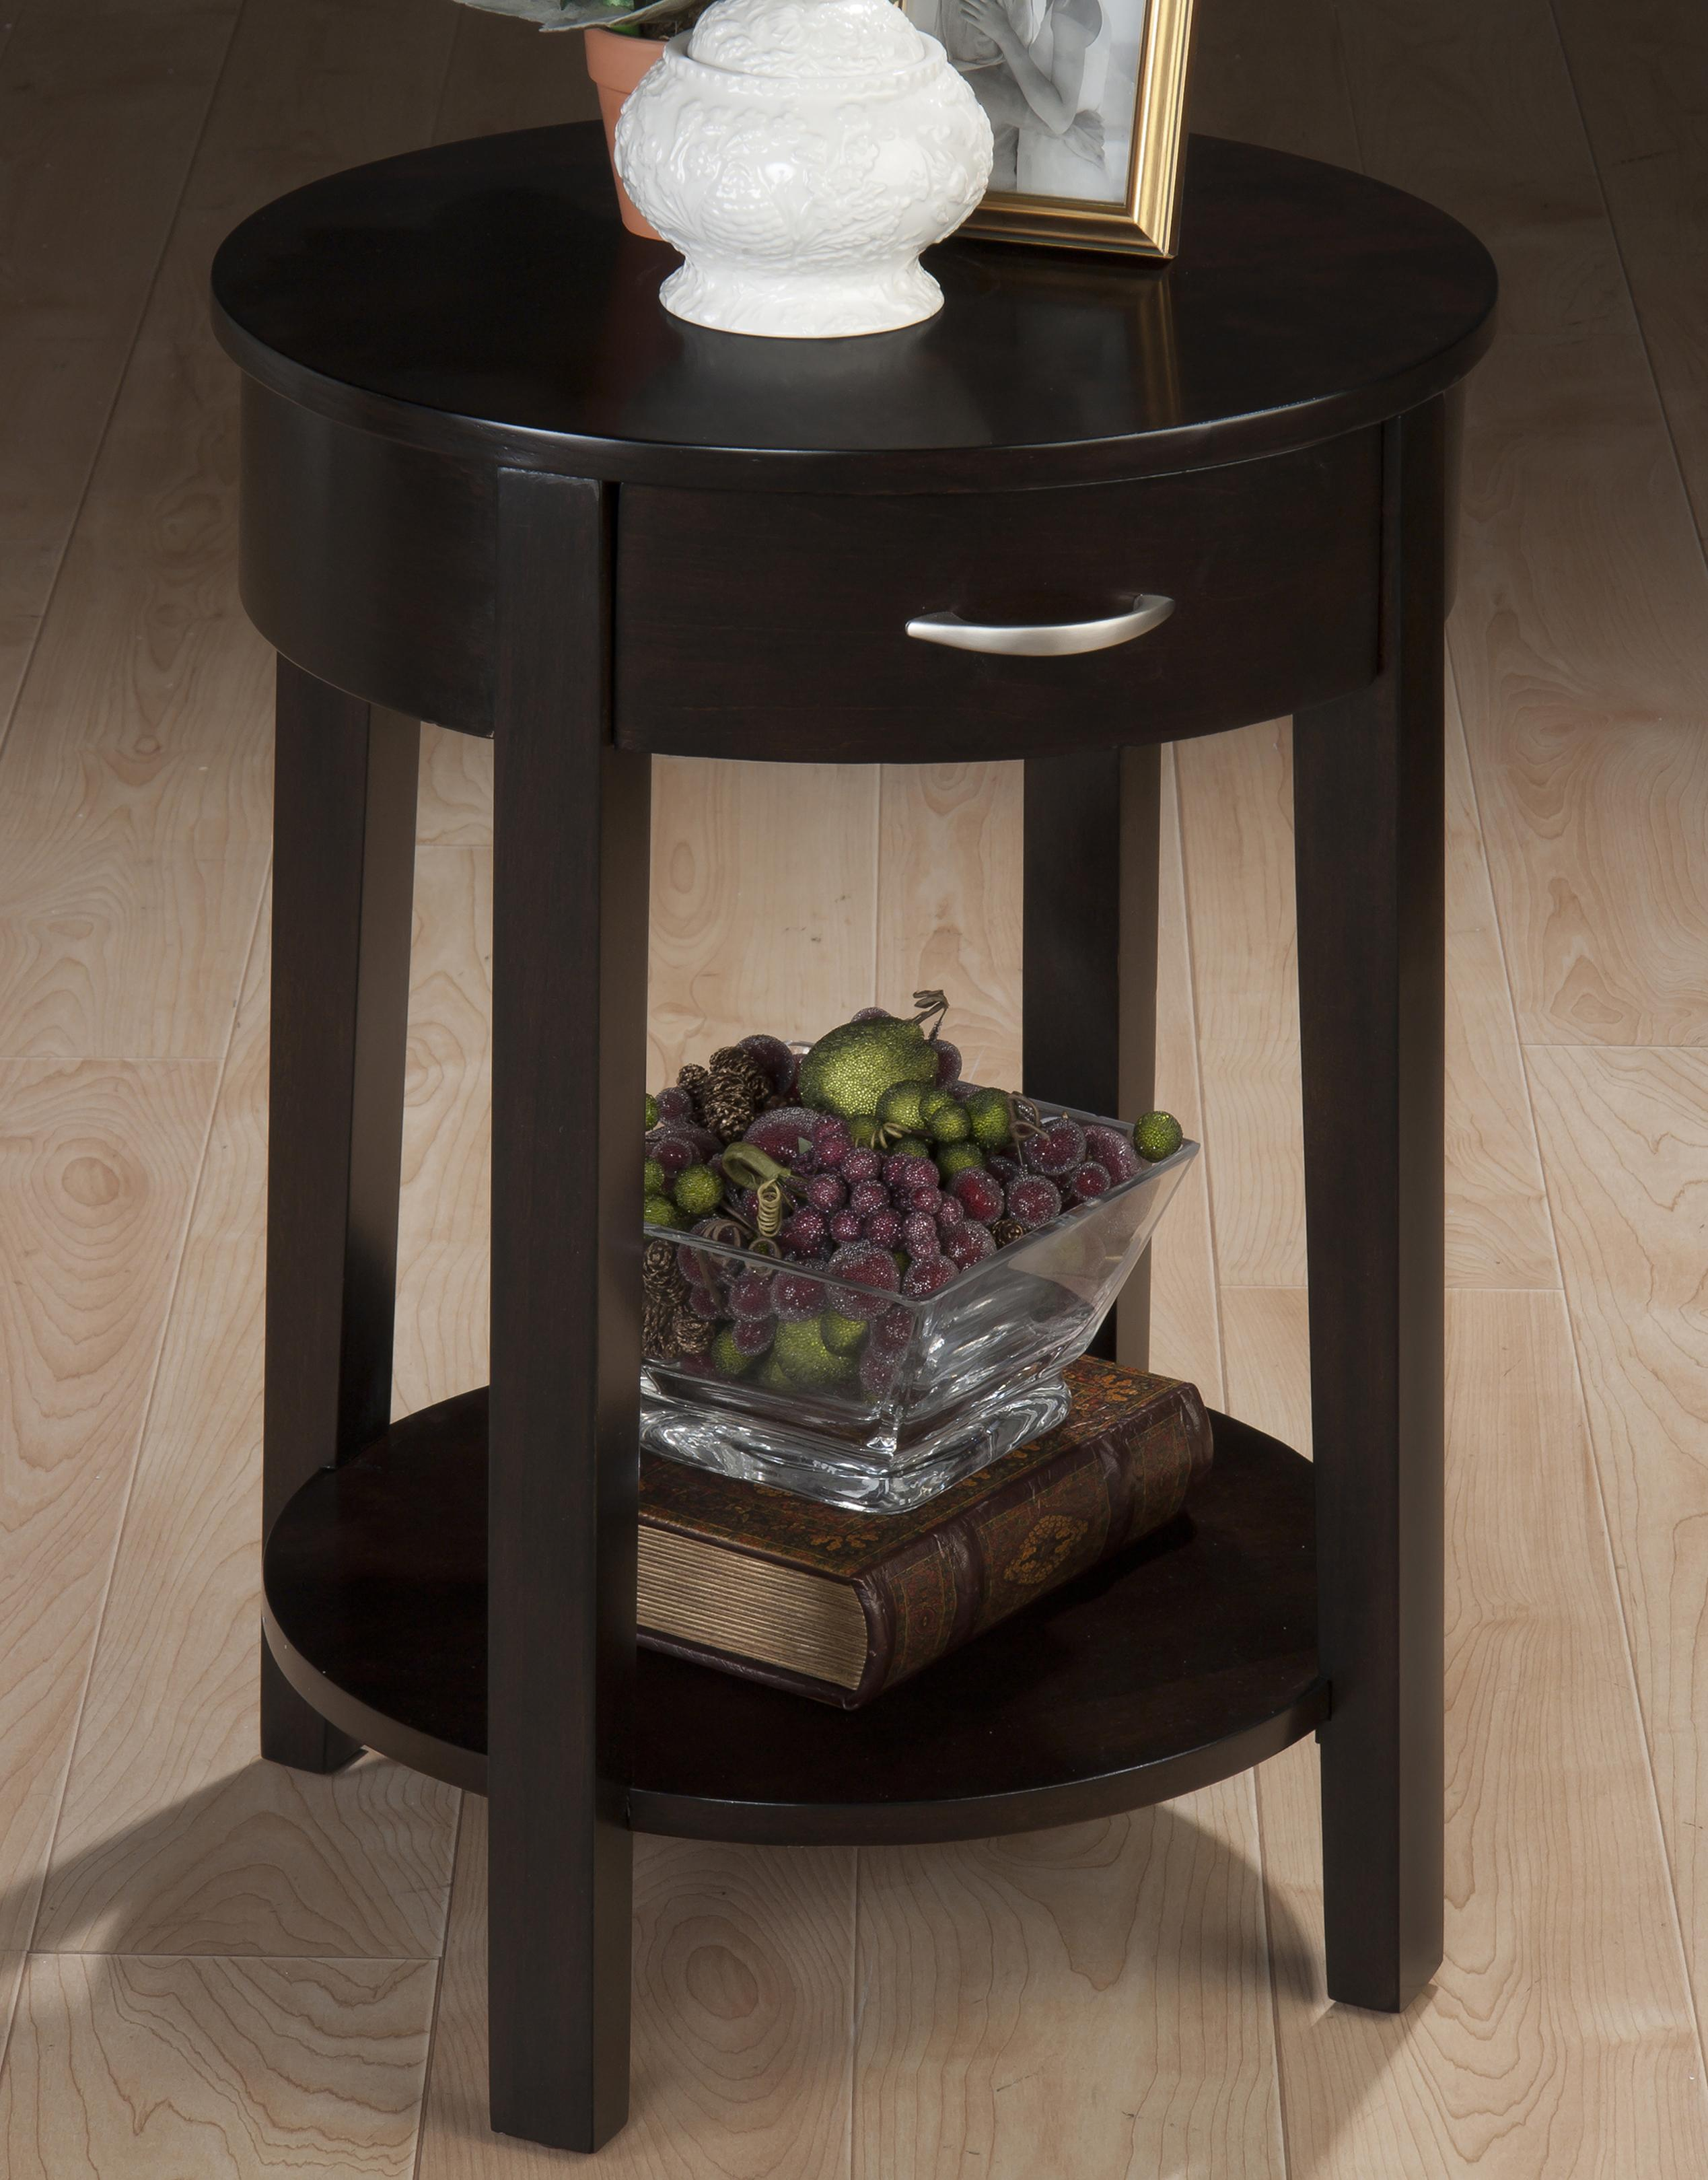 Jofran Dark Merlot Round Chairside Table - Item Number: 1028-7